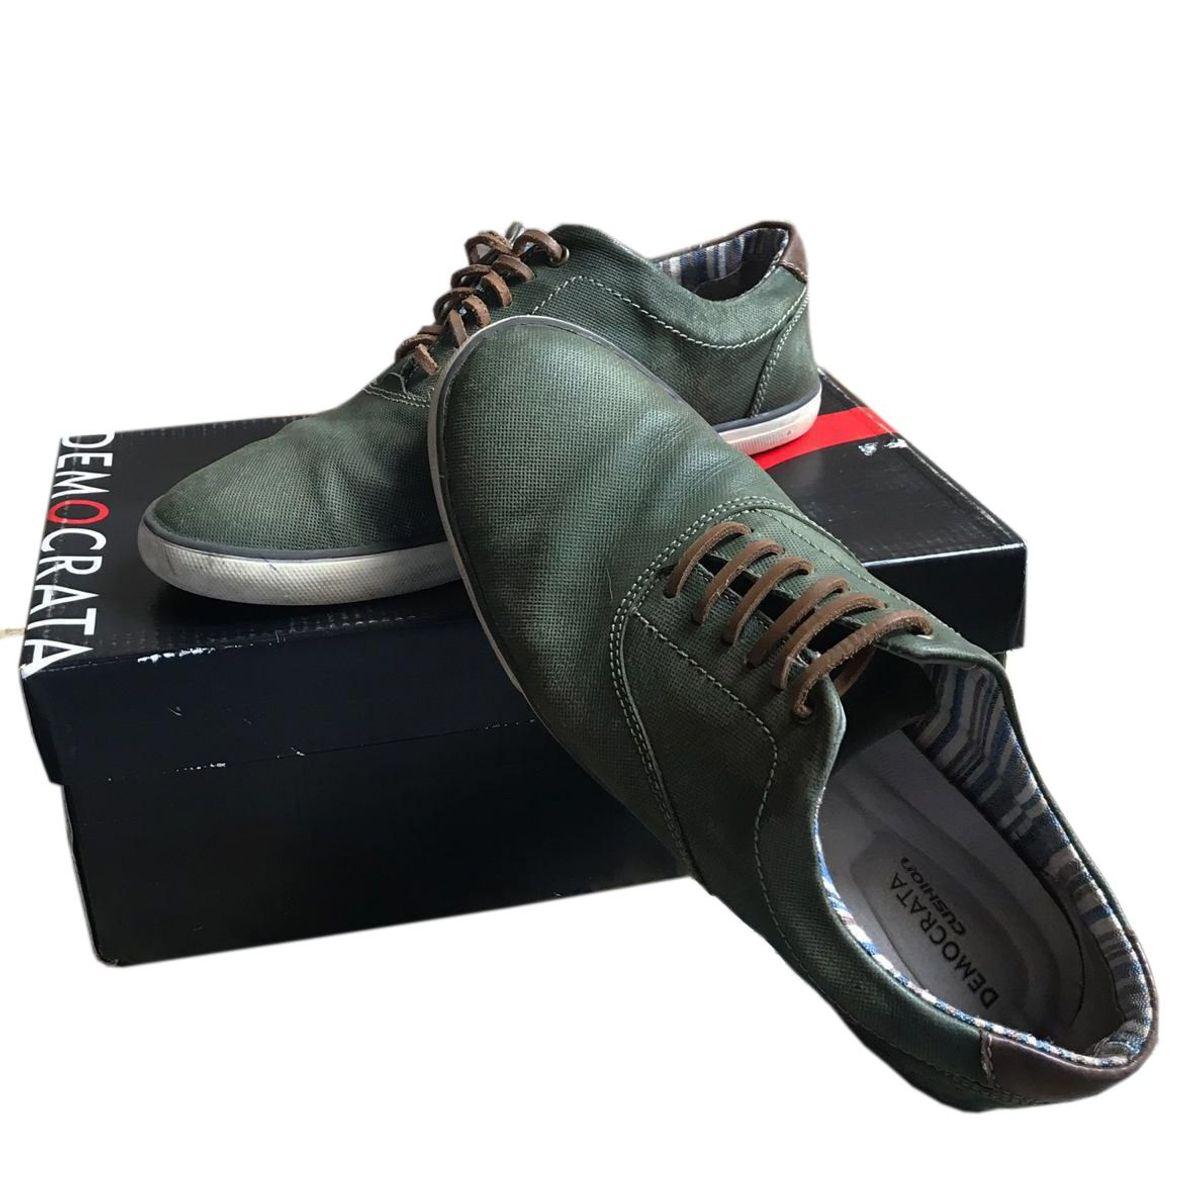 26d94de05 Sapato Democrata Couro Verde Musgo | Sapato Masculino Democrata Usado  33035928 | enjoei